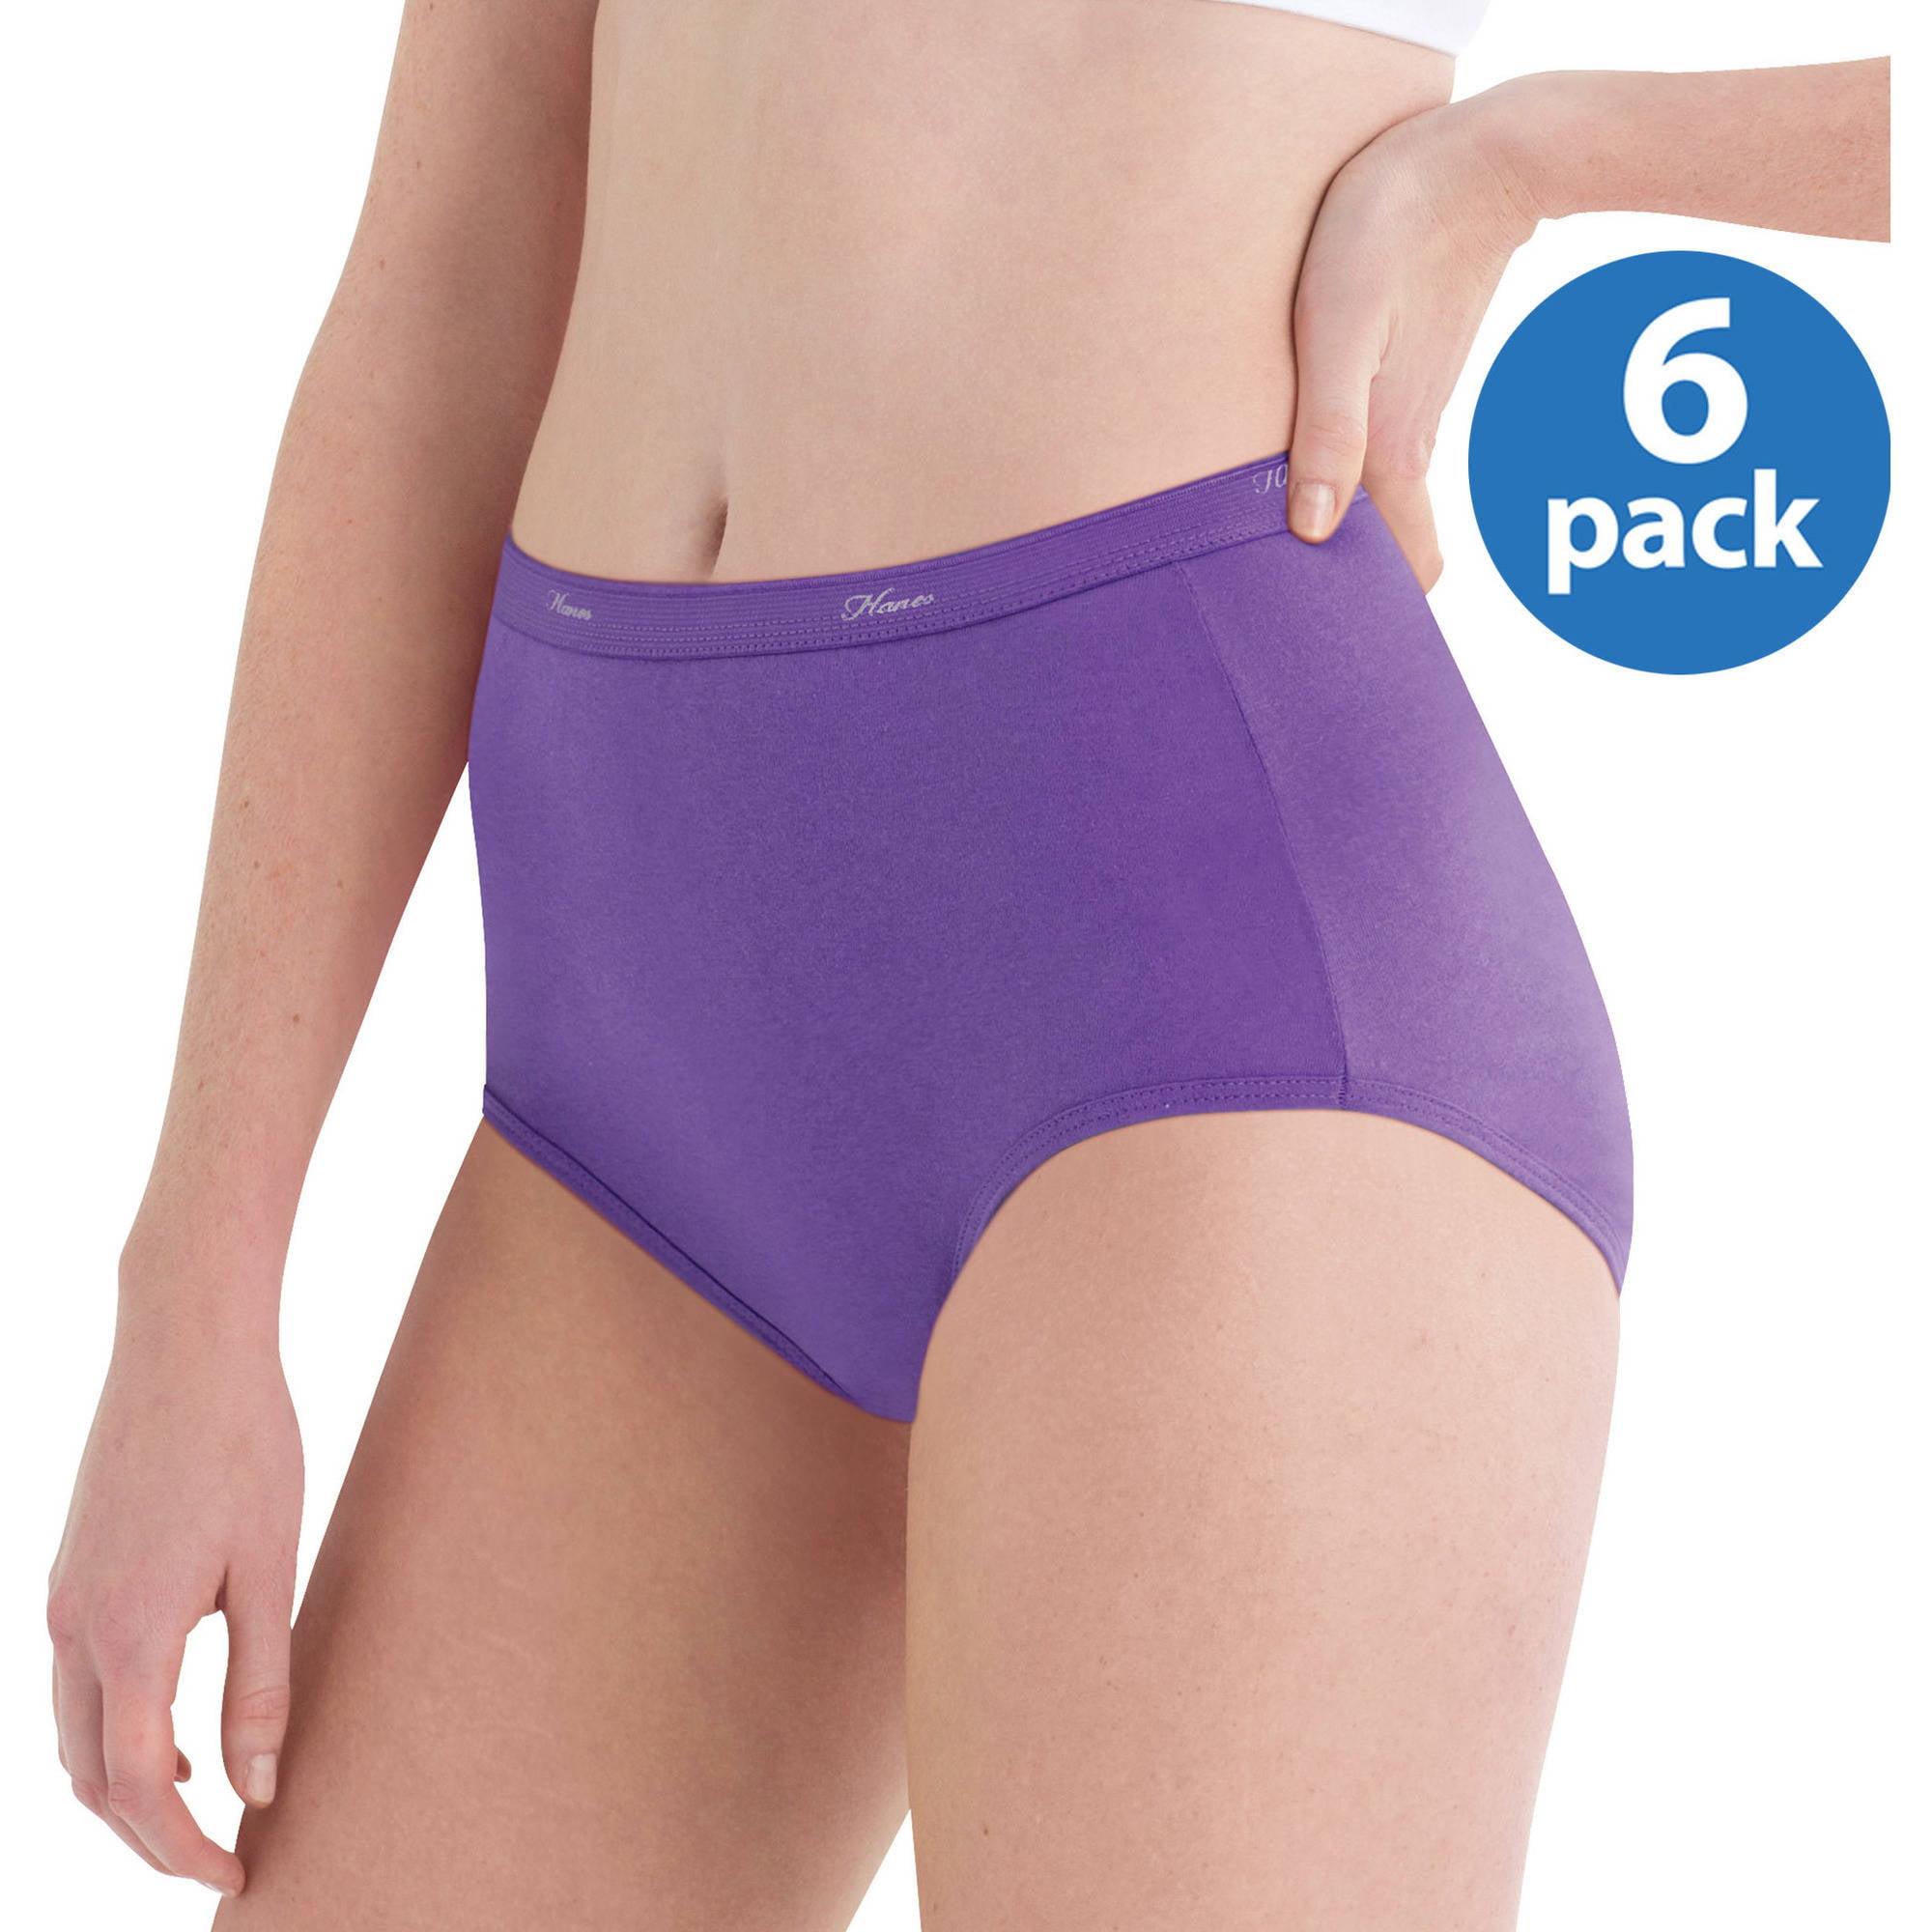 a3d24a59fc7d Hanes - Women's Sporty Cotton Boyshort Panties - 6 Pack - Walmart.com